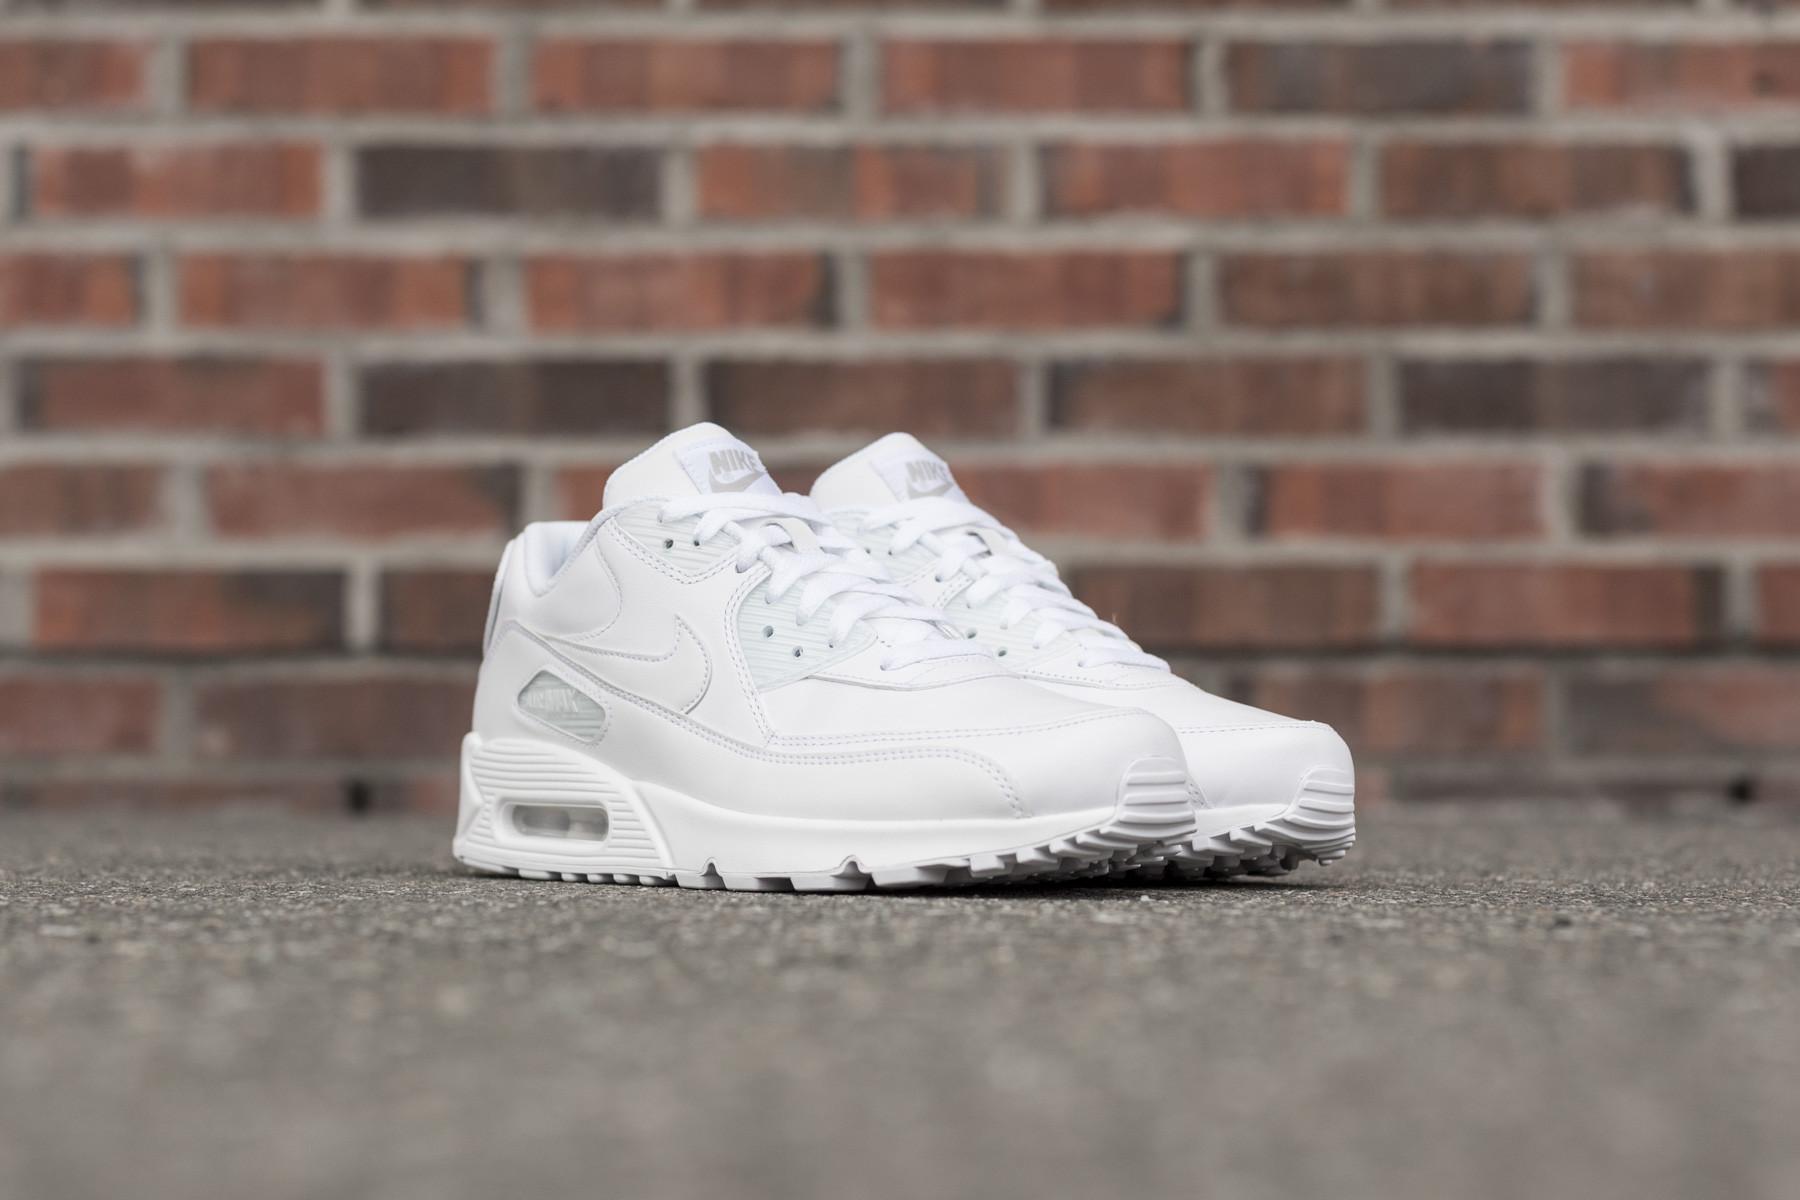 Nike Air Max 90 LTR Sneaker.no